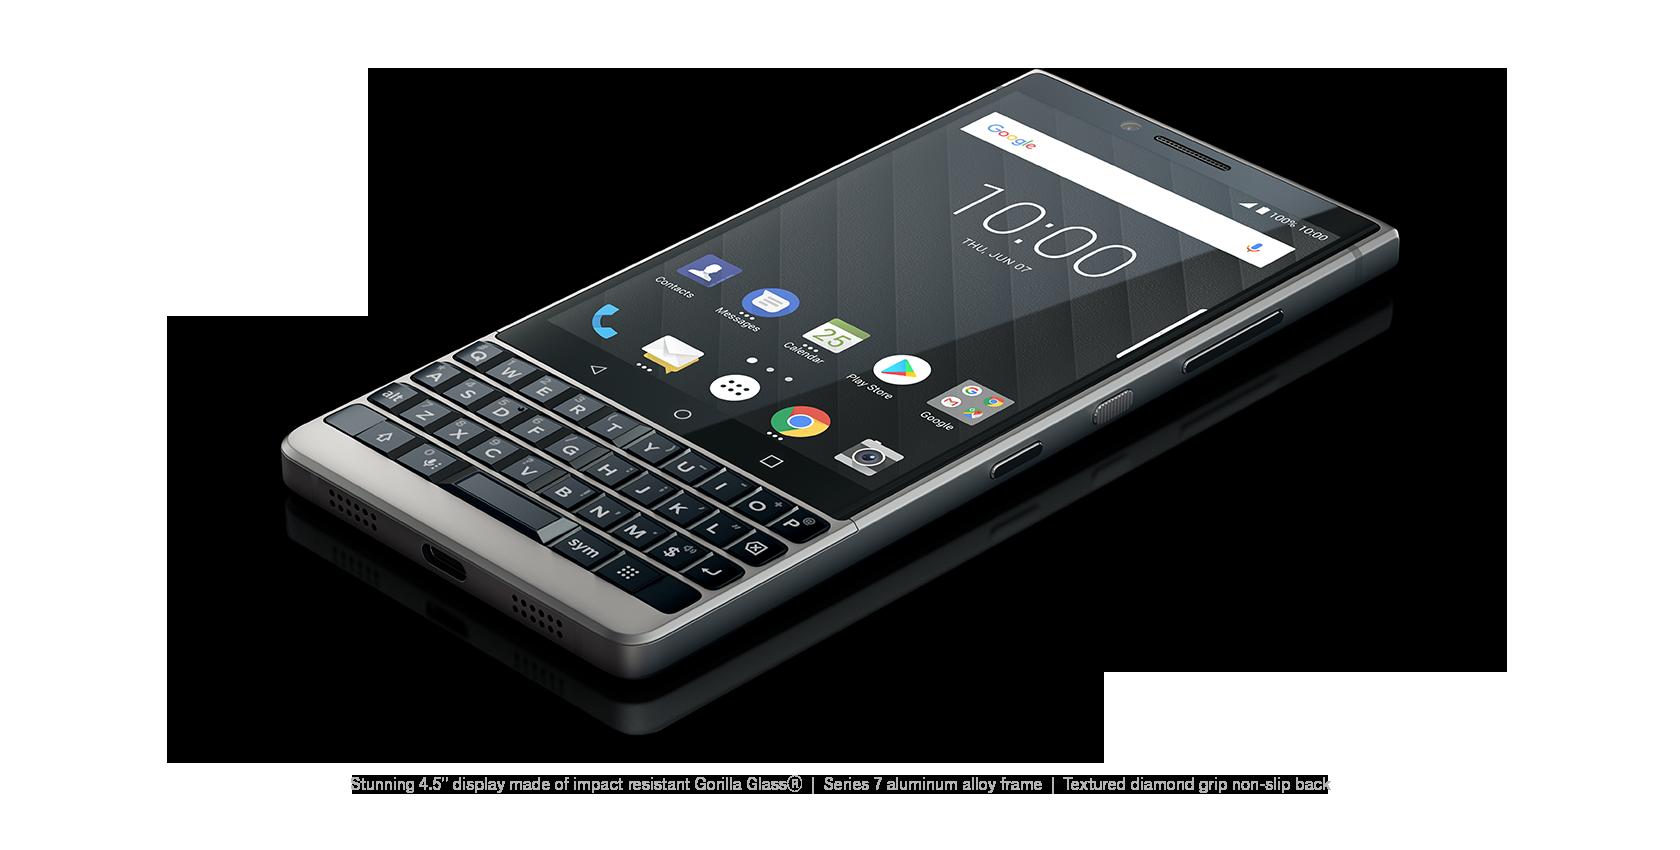 iconic design 1 - BlackBerry KEY2